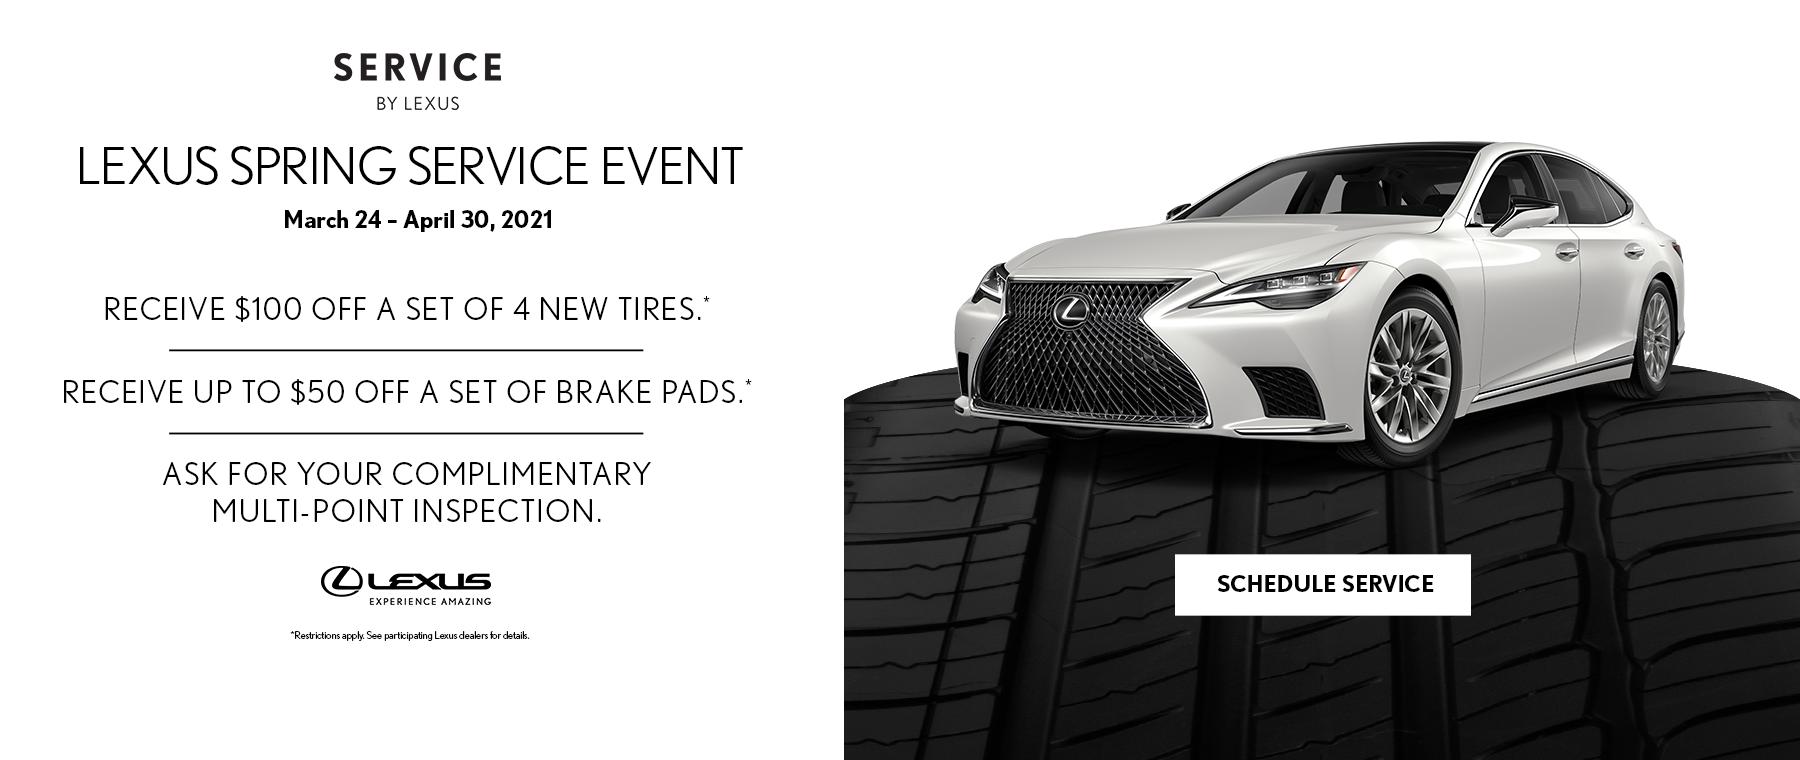 Lexus Spring Service Event